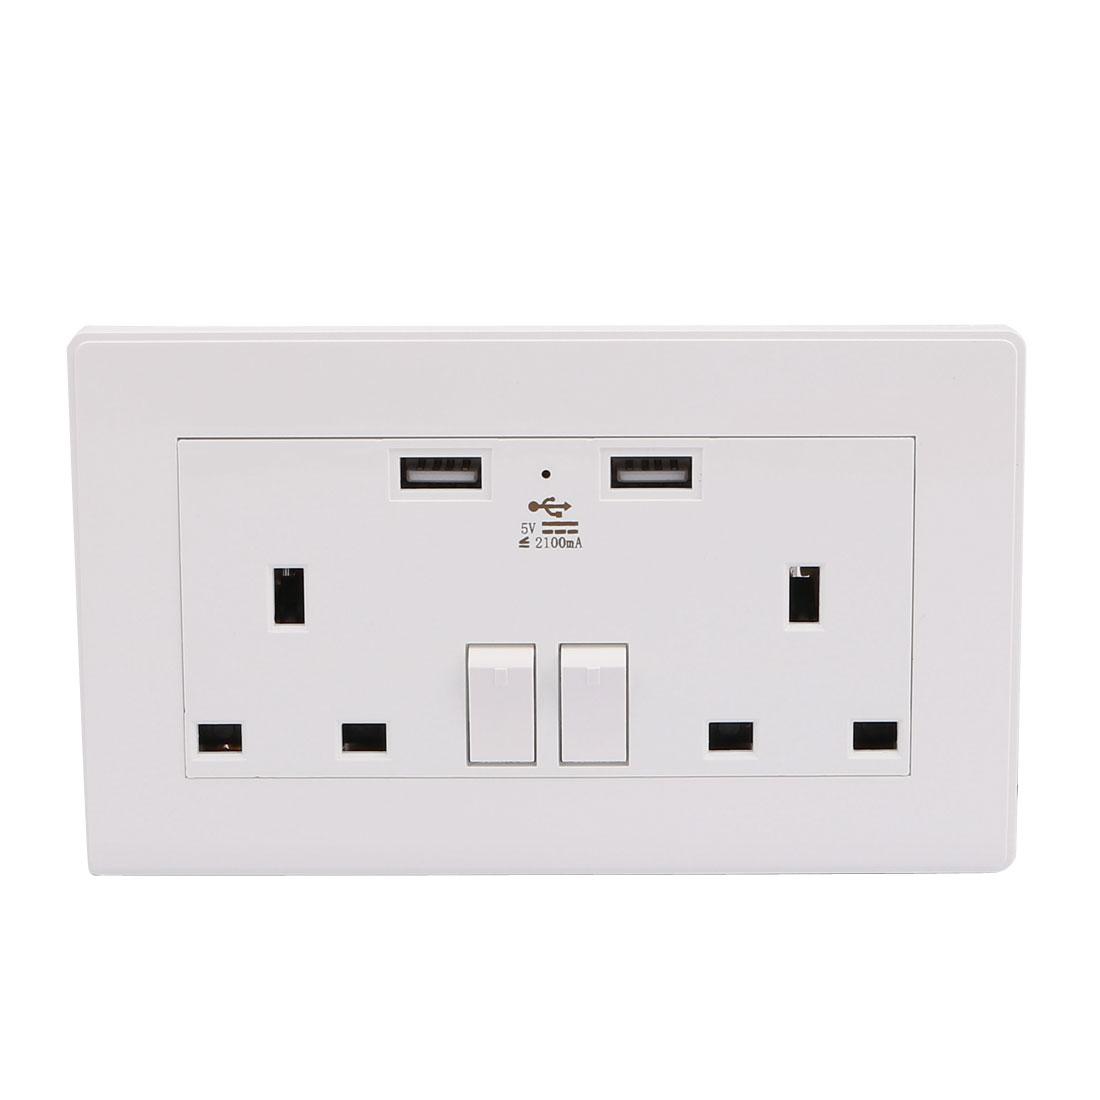 Dual AC 110V-250V UK Socket 2 USB Port 5VDC 2100mA Charger Charging Power Switch Wall Outlet